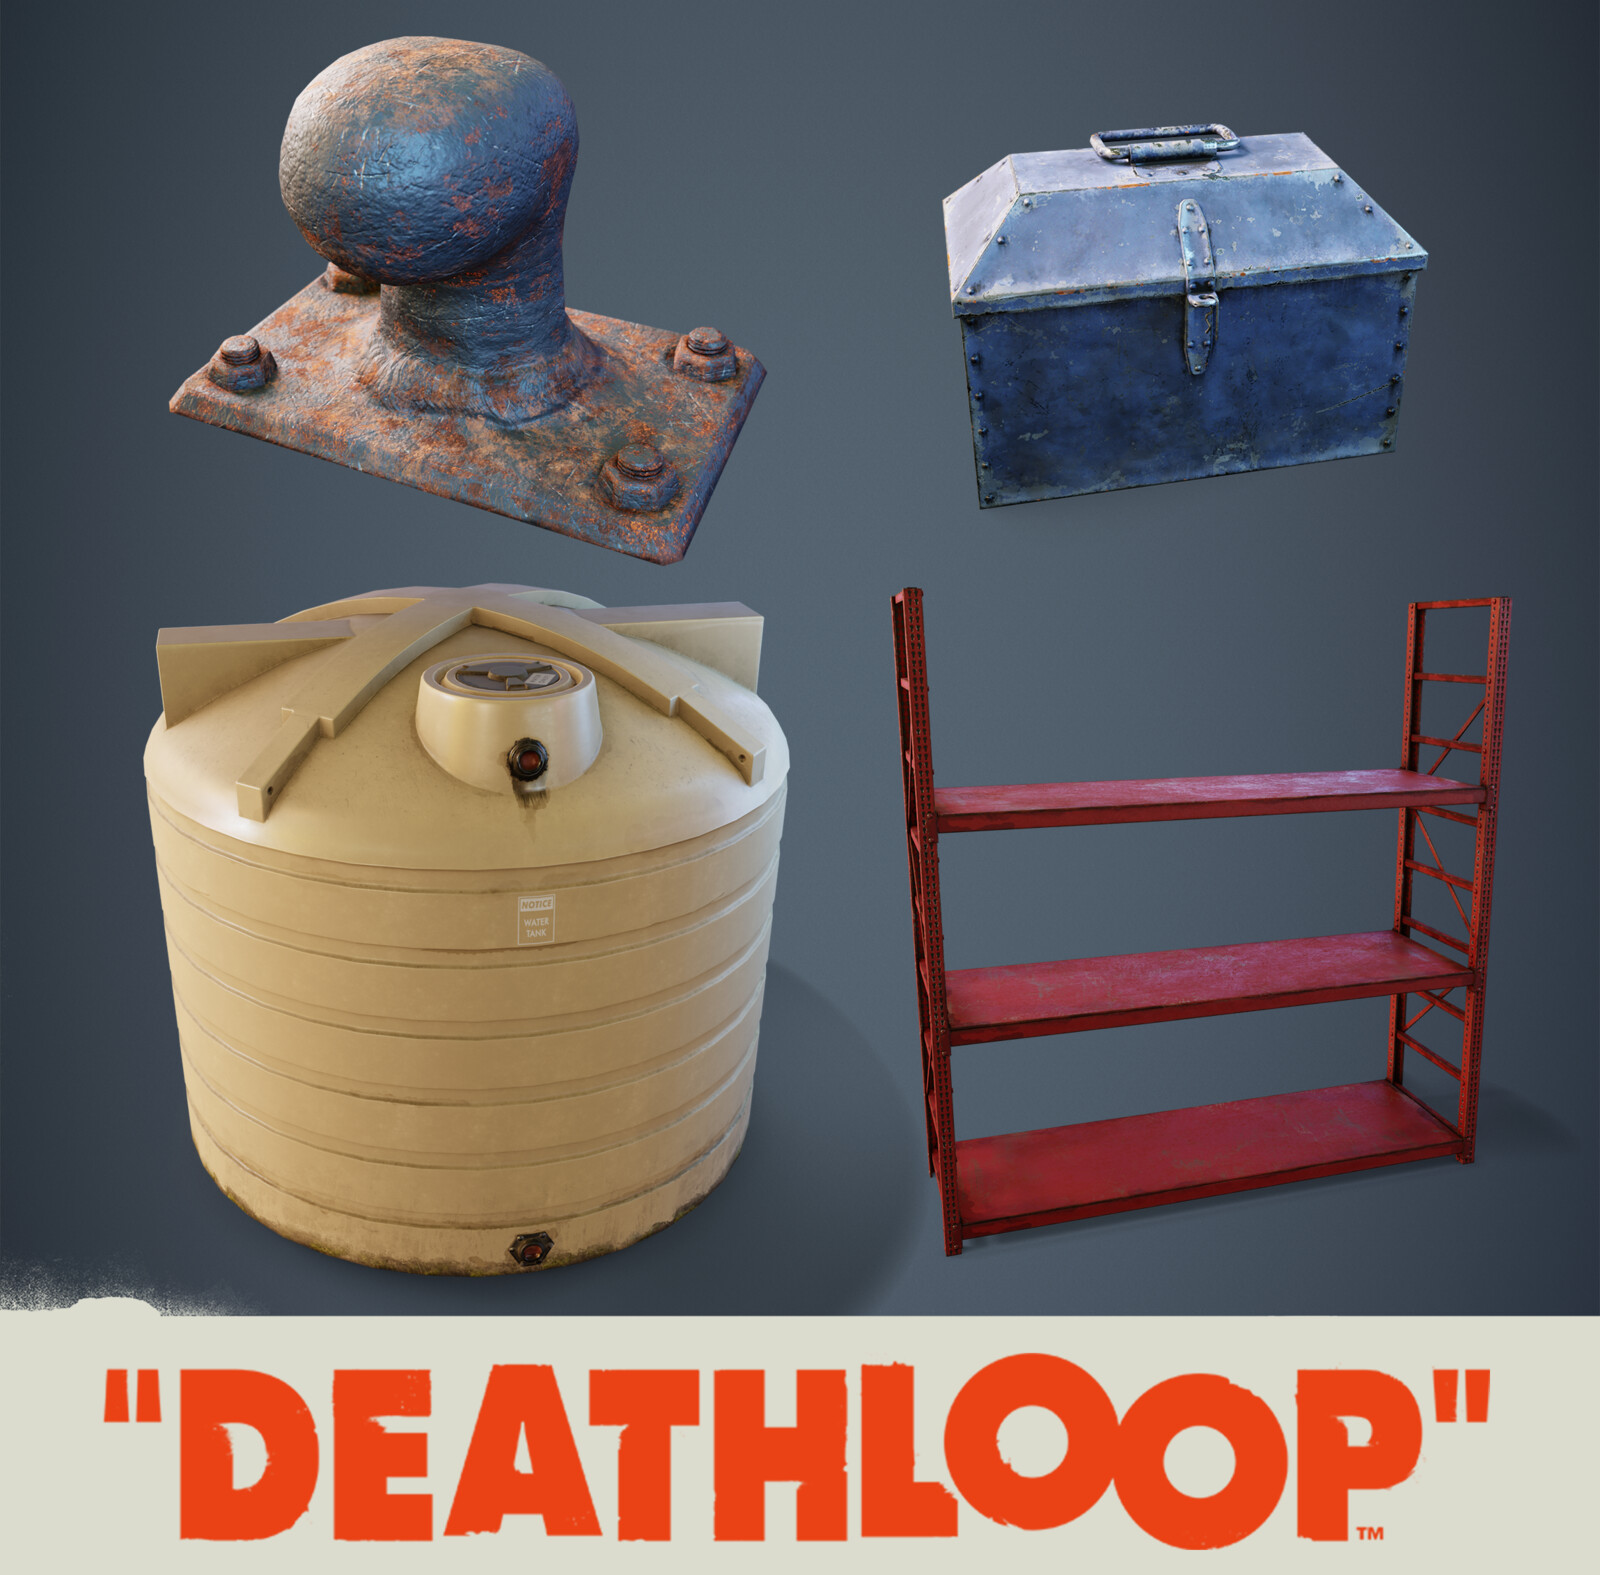 Industrial: Deathloop Props